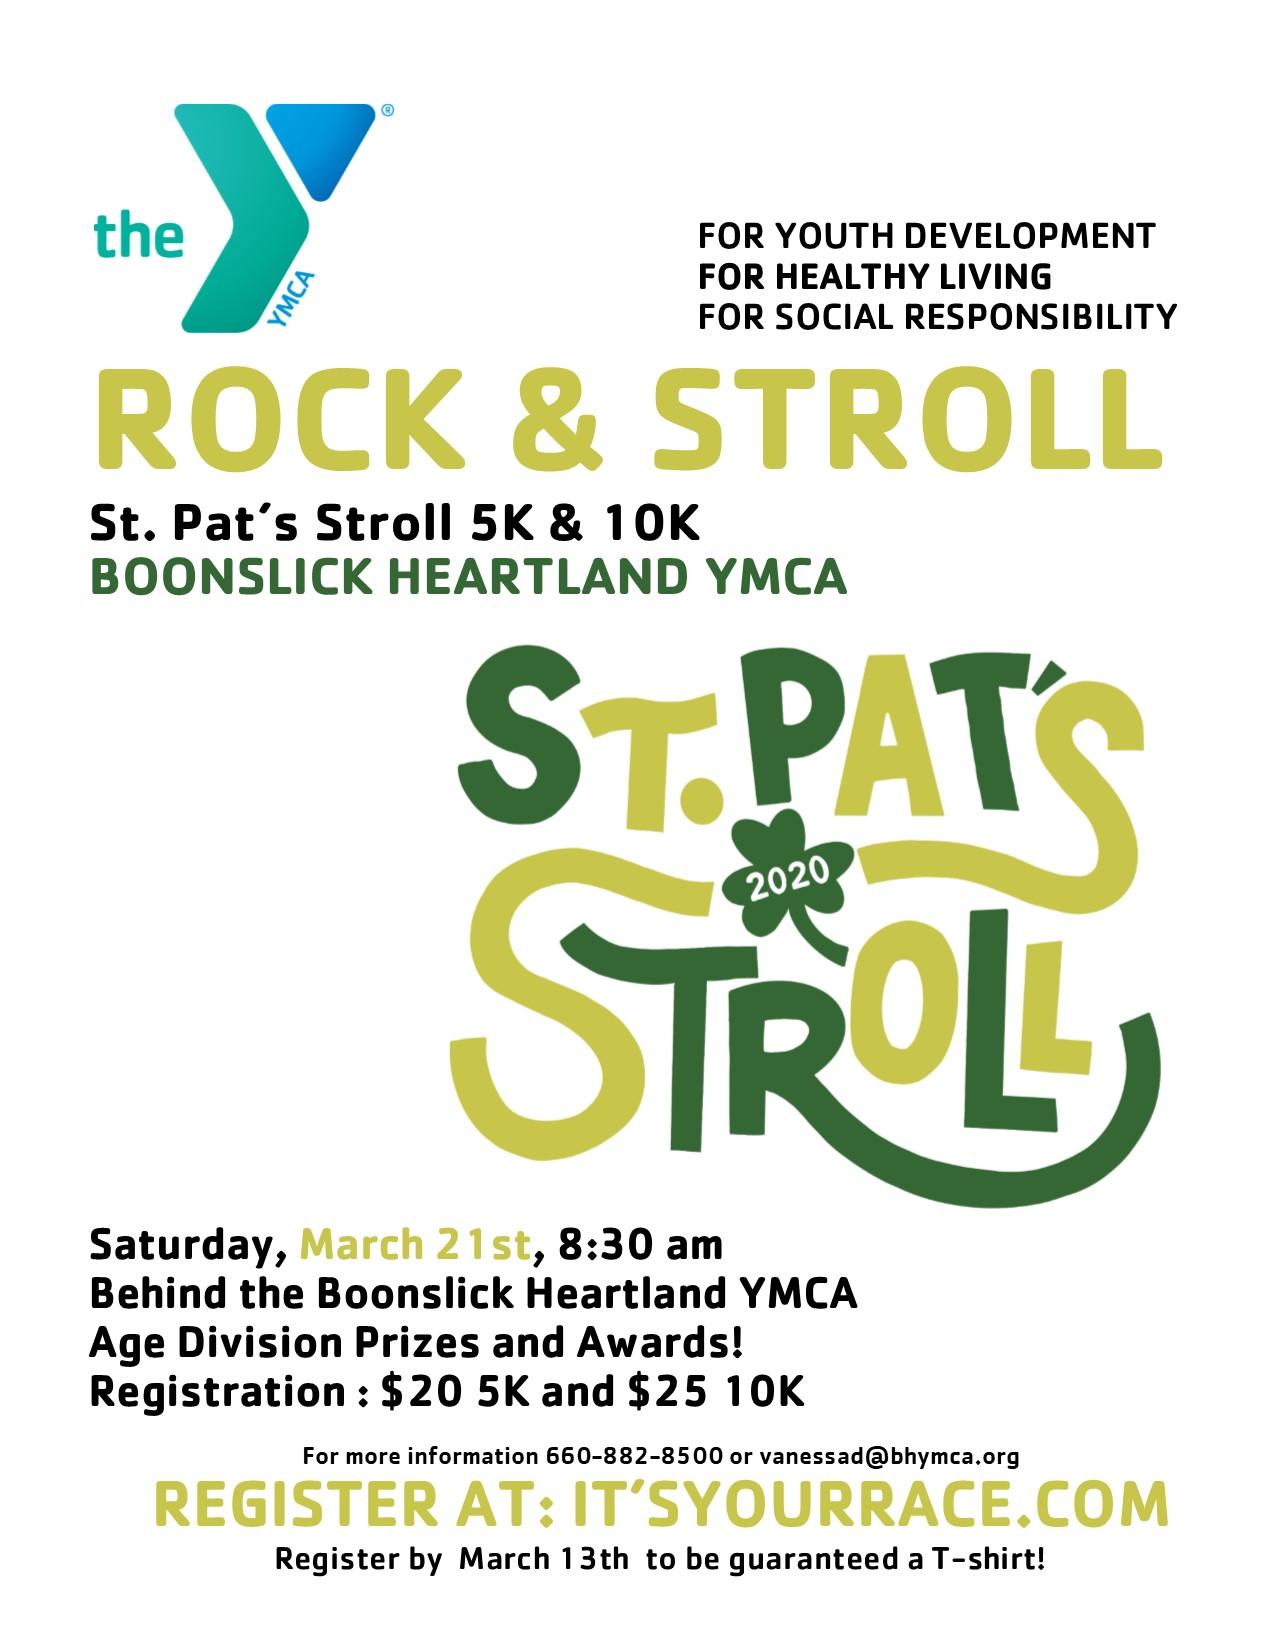 St Pat's Stroll Flyer 2020